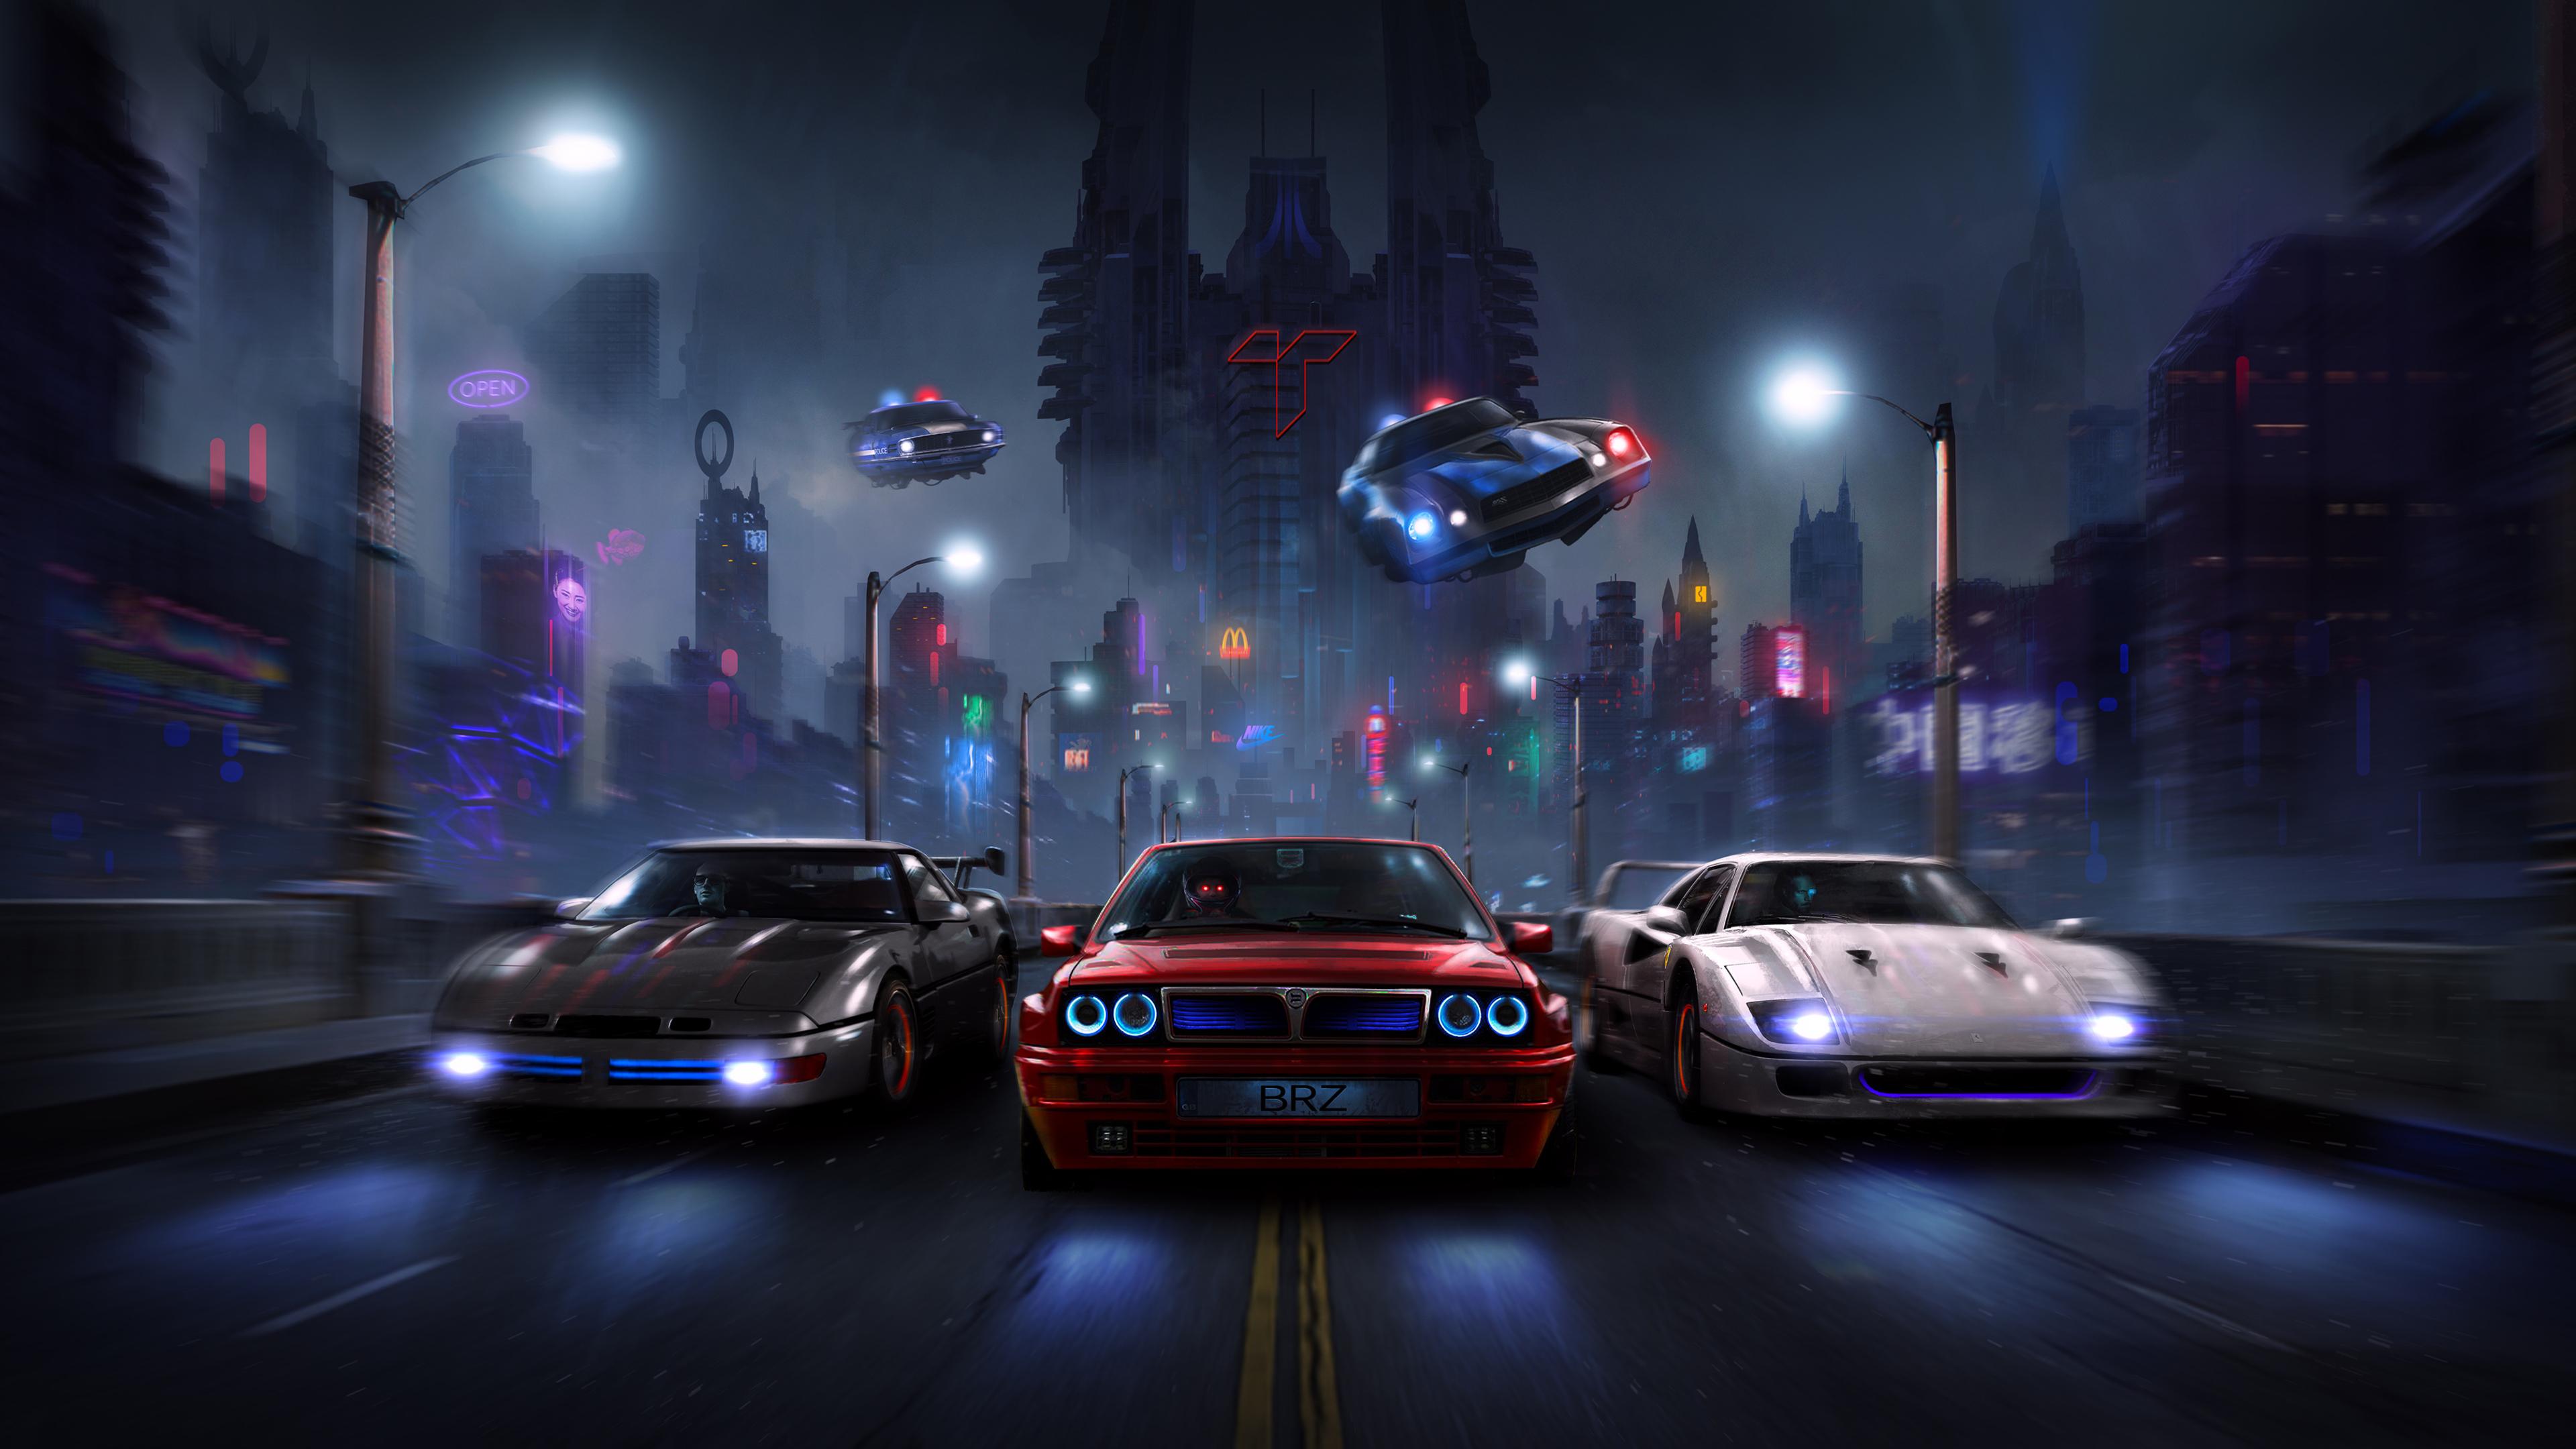 racers night chase 4k 1546362155 - Racers Night Chase 4k - hd-wallpapers, digital art wallpapers, deviantart wallpapers, cars wallpapers, artwork wallpapers, artist wallpapers, 4k-wallpapers